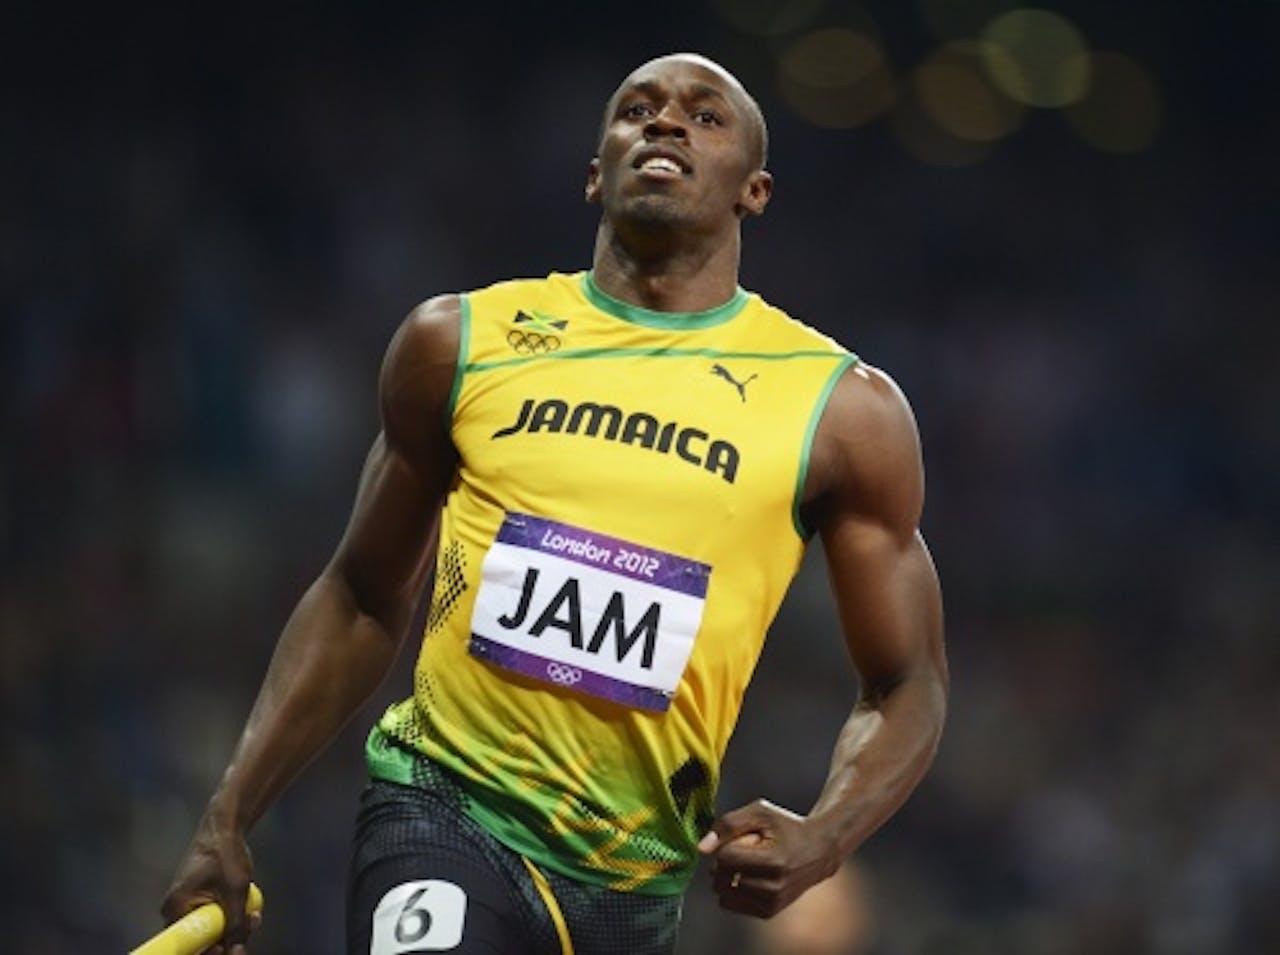 Archiefbeeld Usain Bolt. EPA